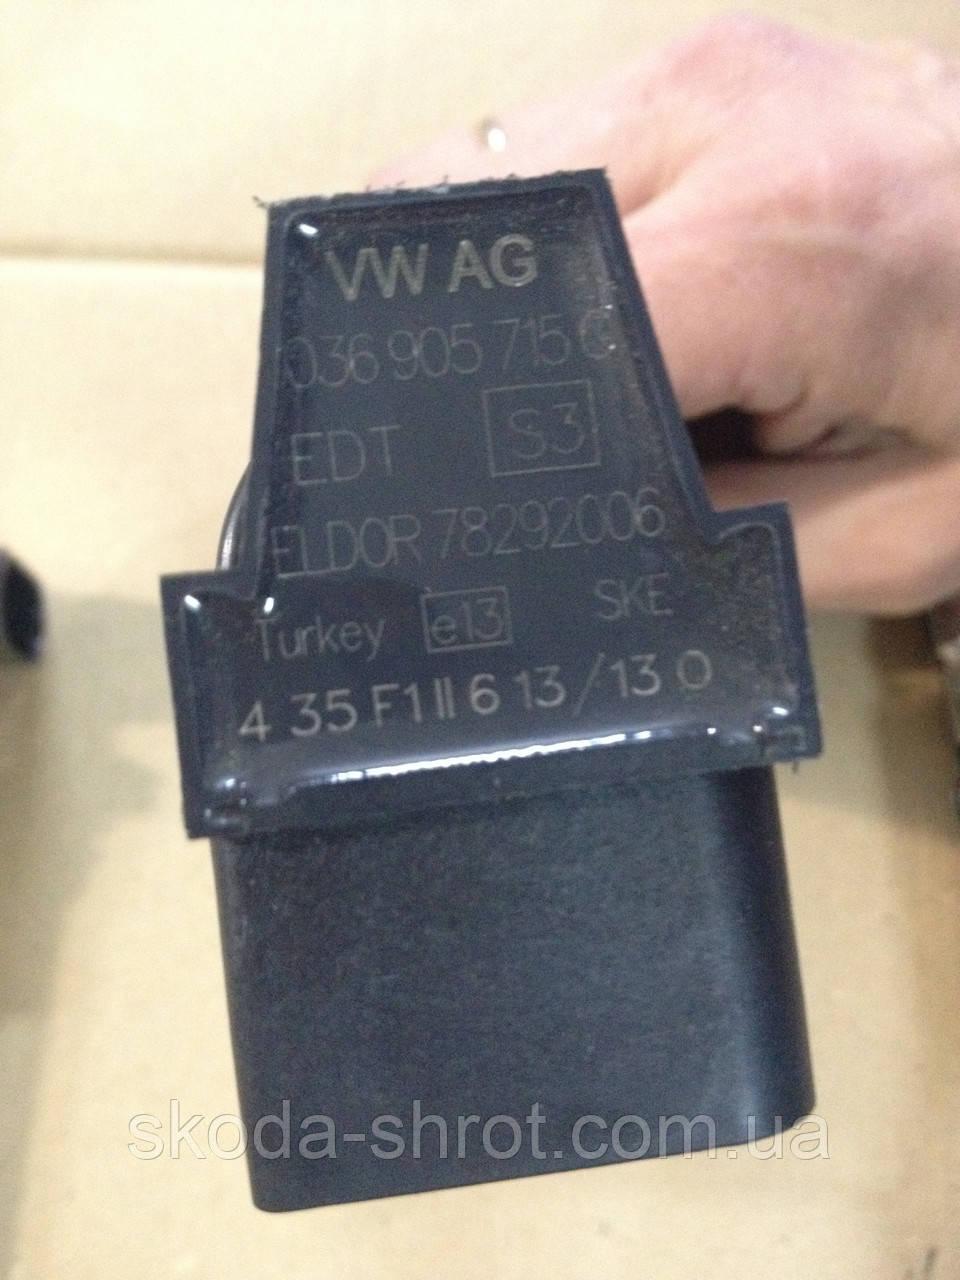 Катушка зажигания Шкода Фабия - II 1.4 бензин (шкода фабия) 036905715G